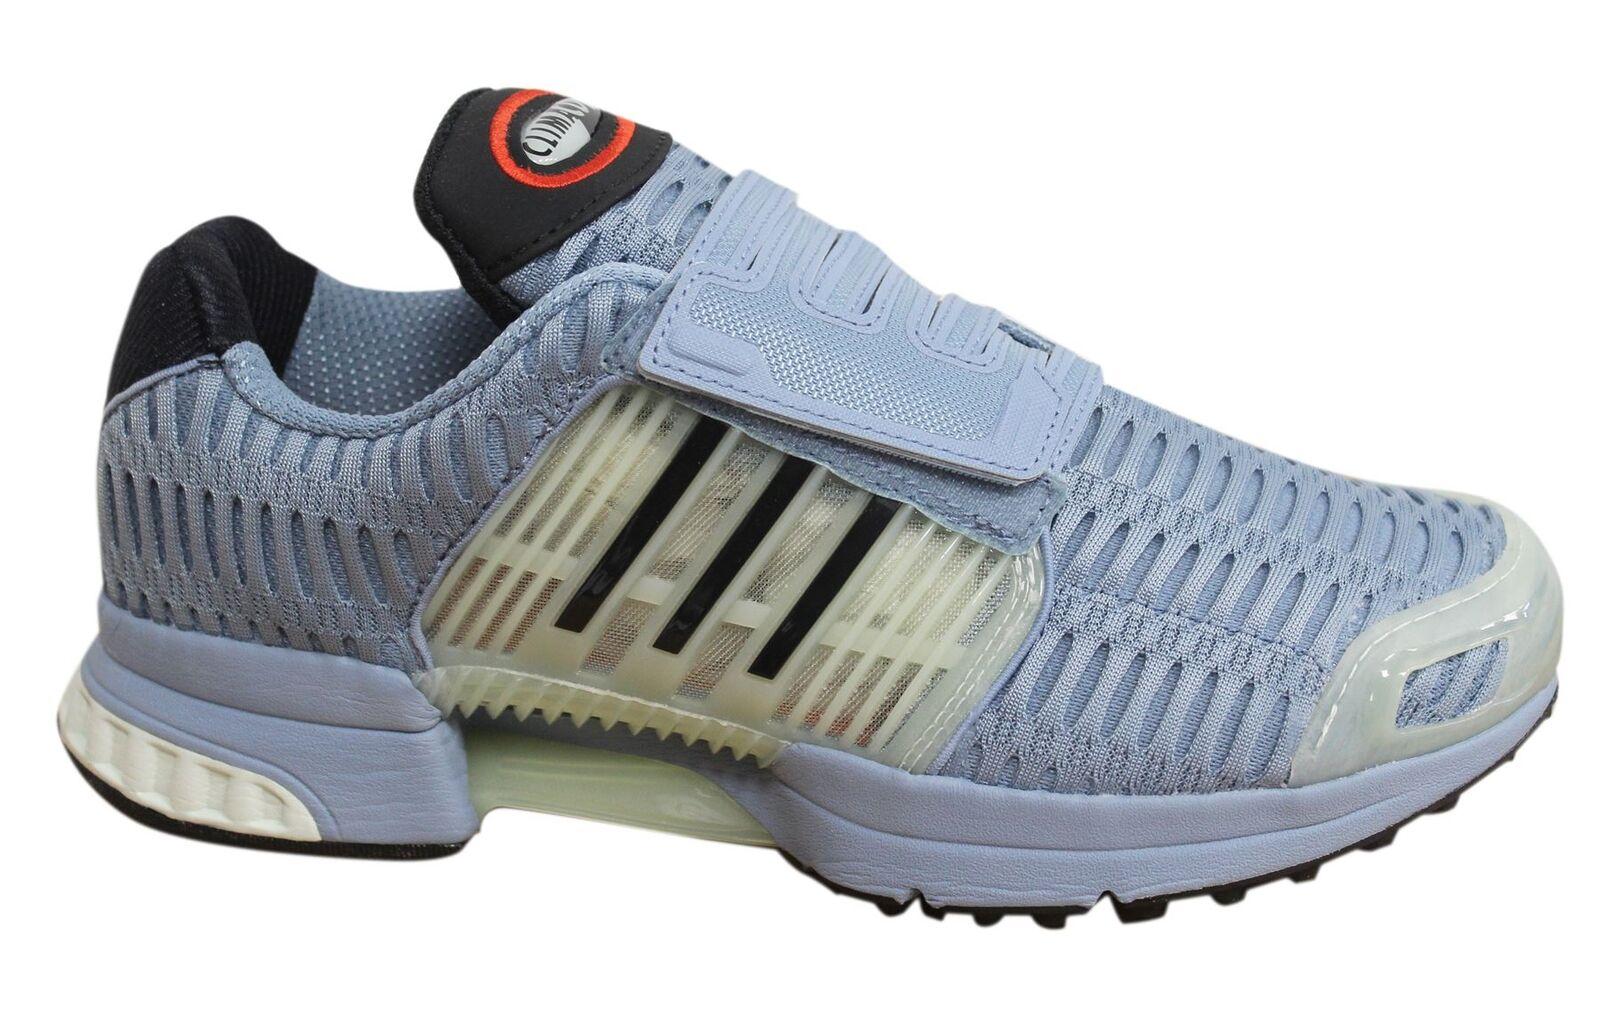 Adidas Original Climacool 1 CMF Riemen oben Textil Herren Turnschuhe ba7267 M9